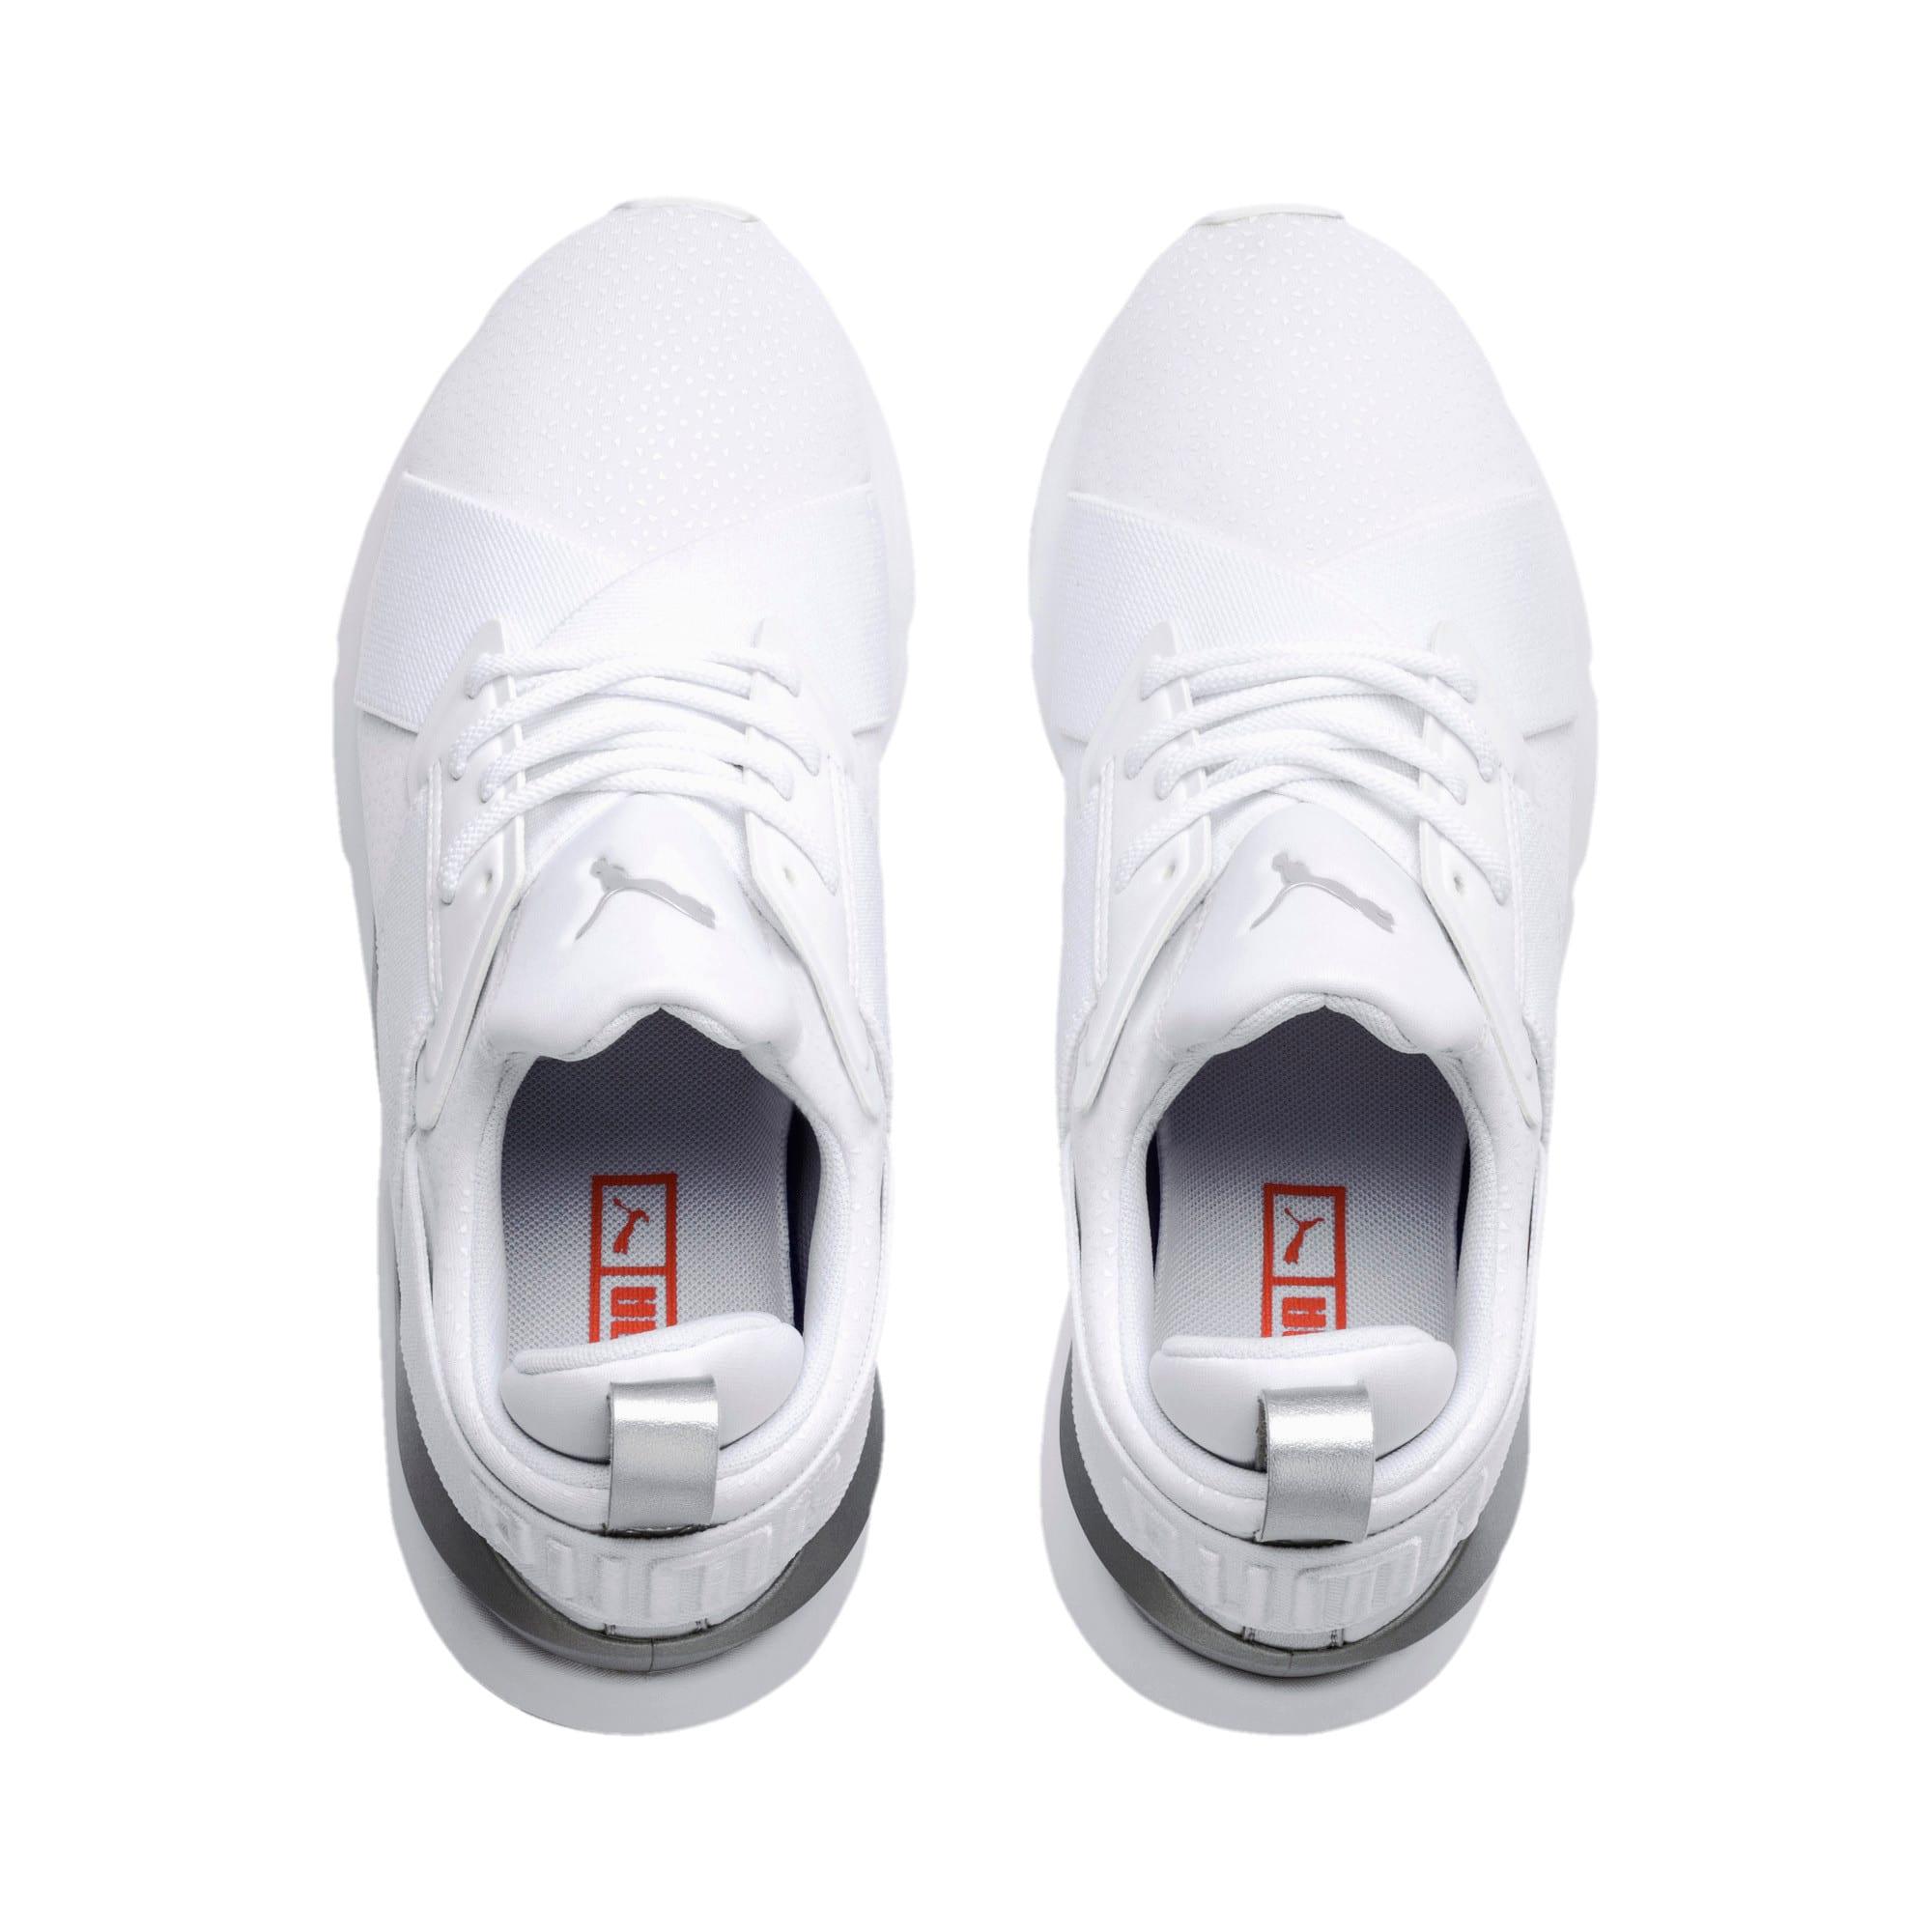 Thumbnail 6 of Muse Perf Women's Sneakers, Puma White-Puma Silver, medium